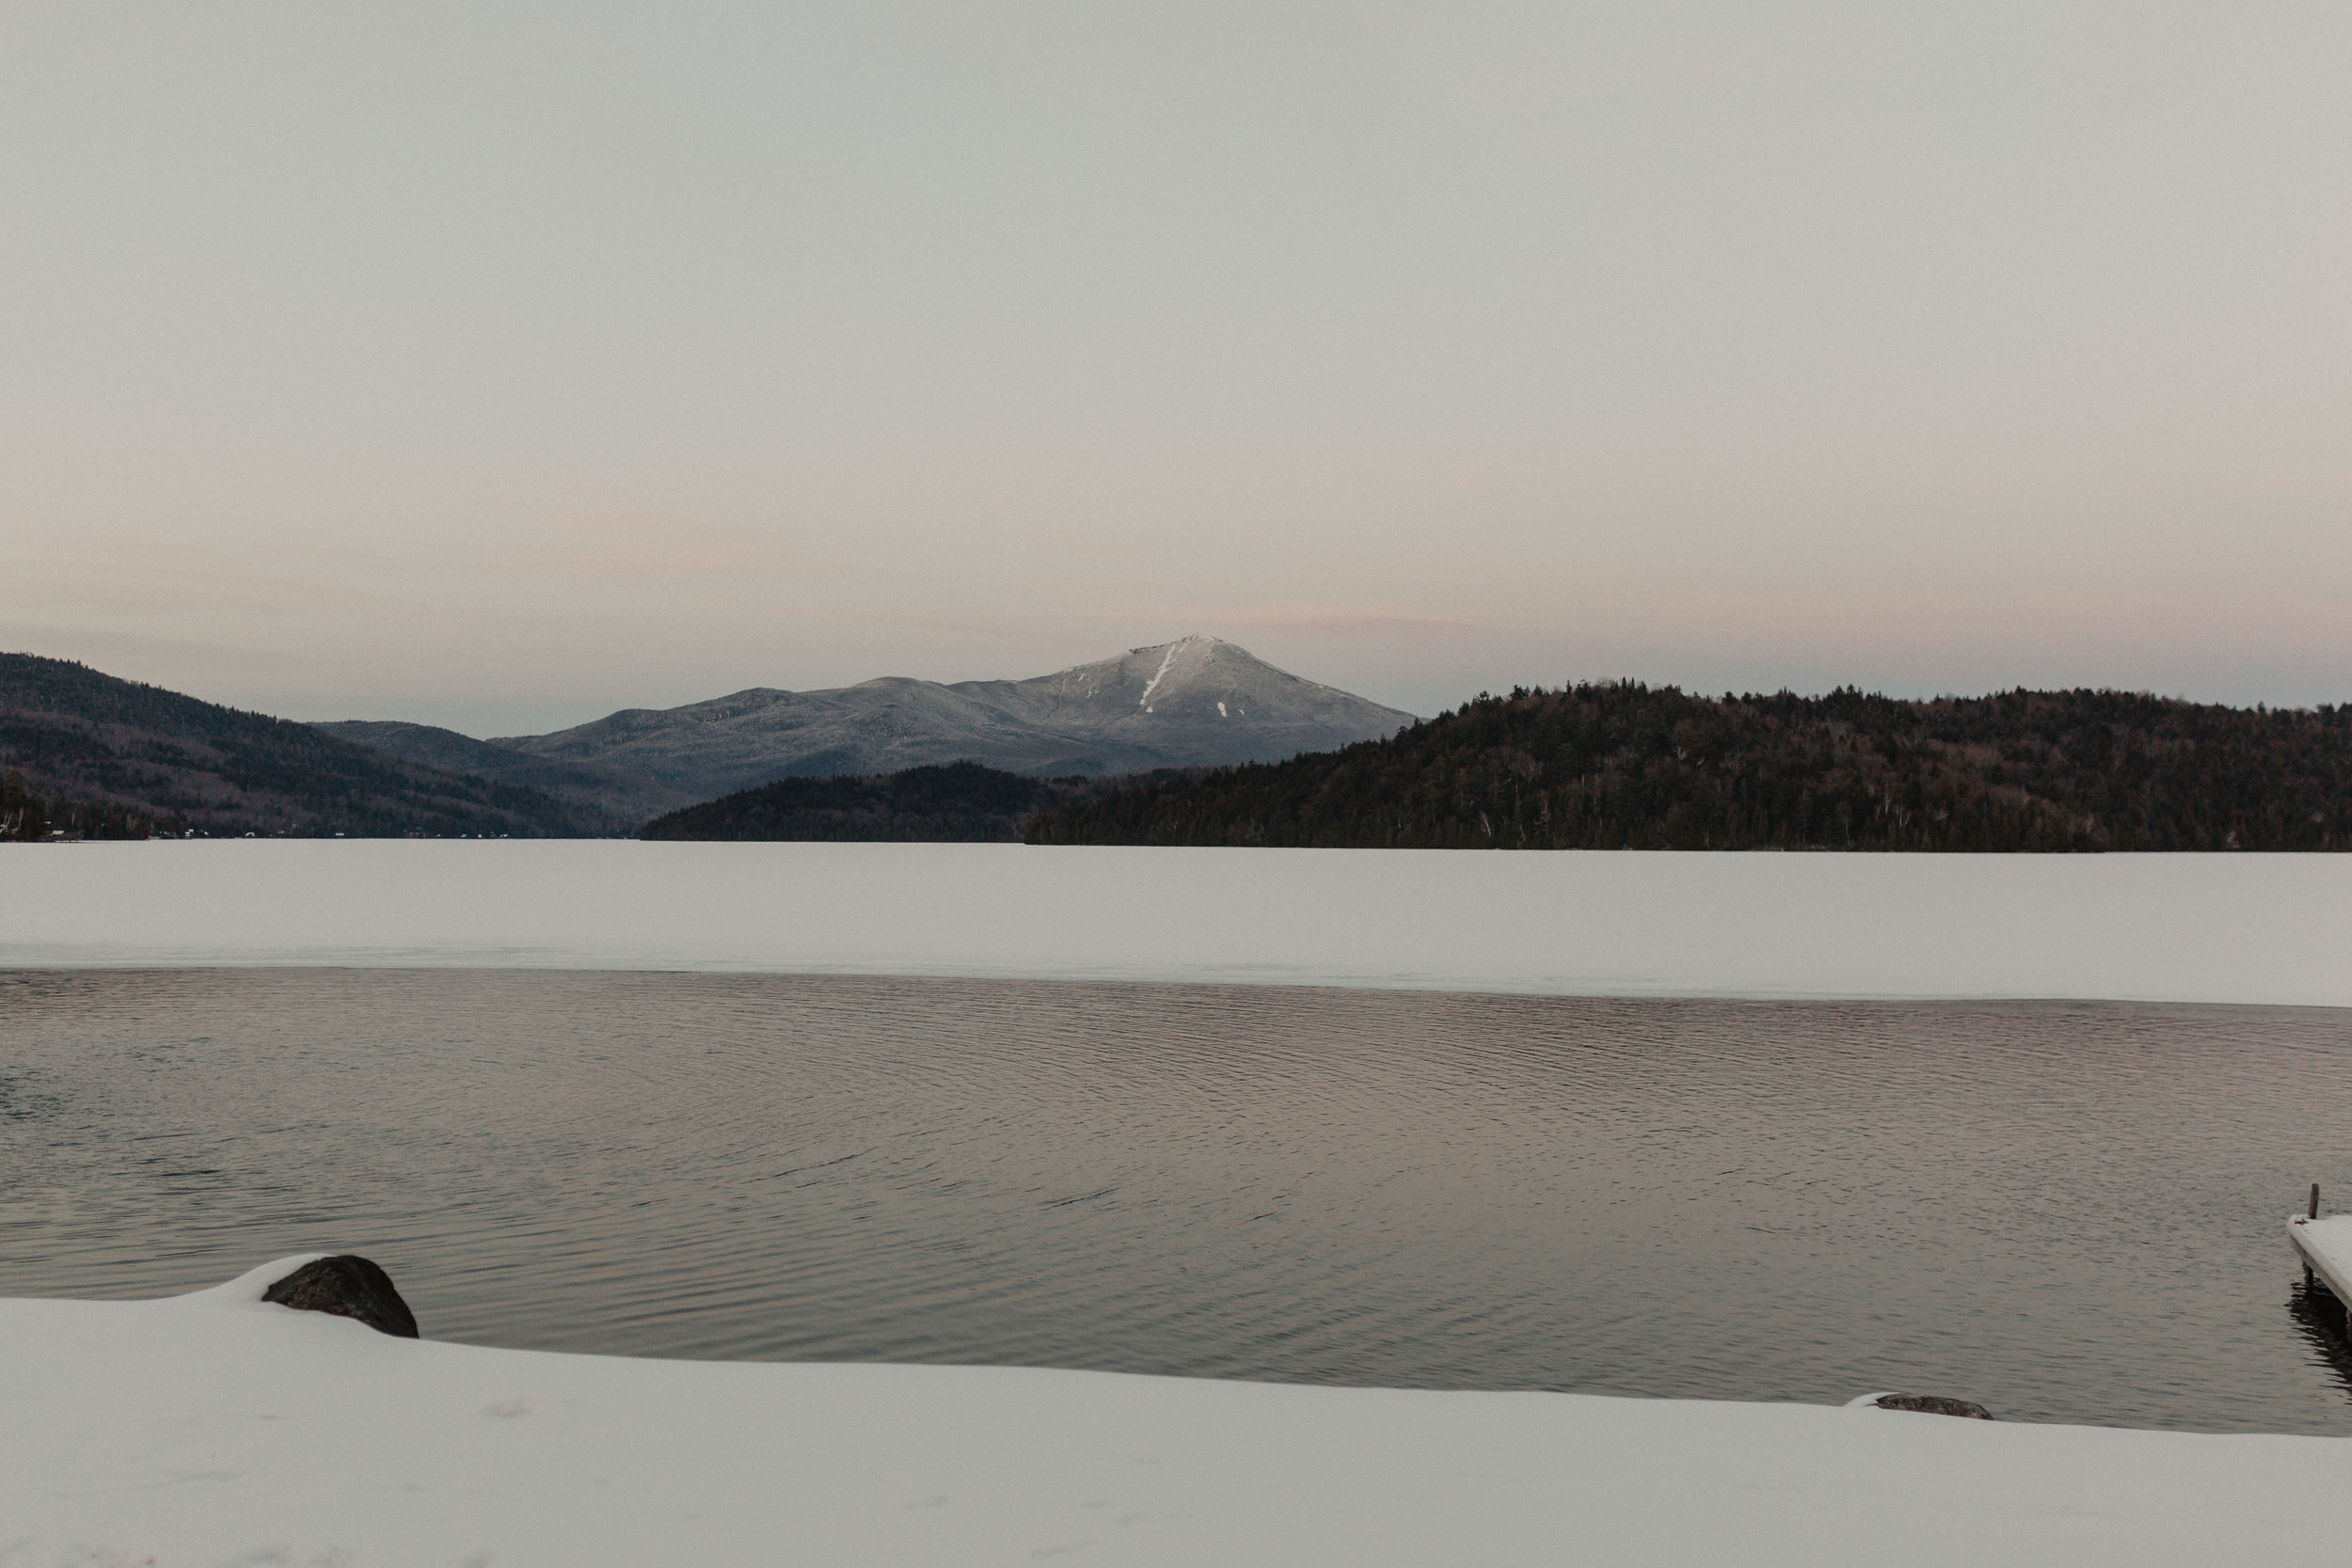 lake_placid_lodge_elopement_078.JPG